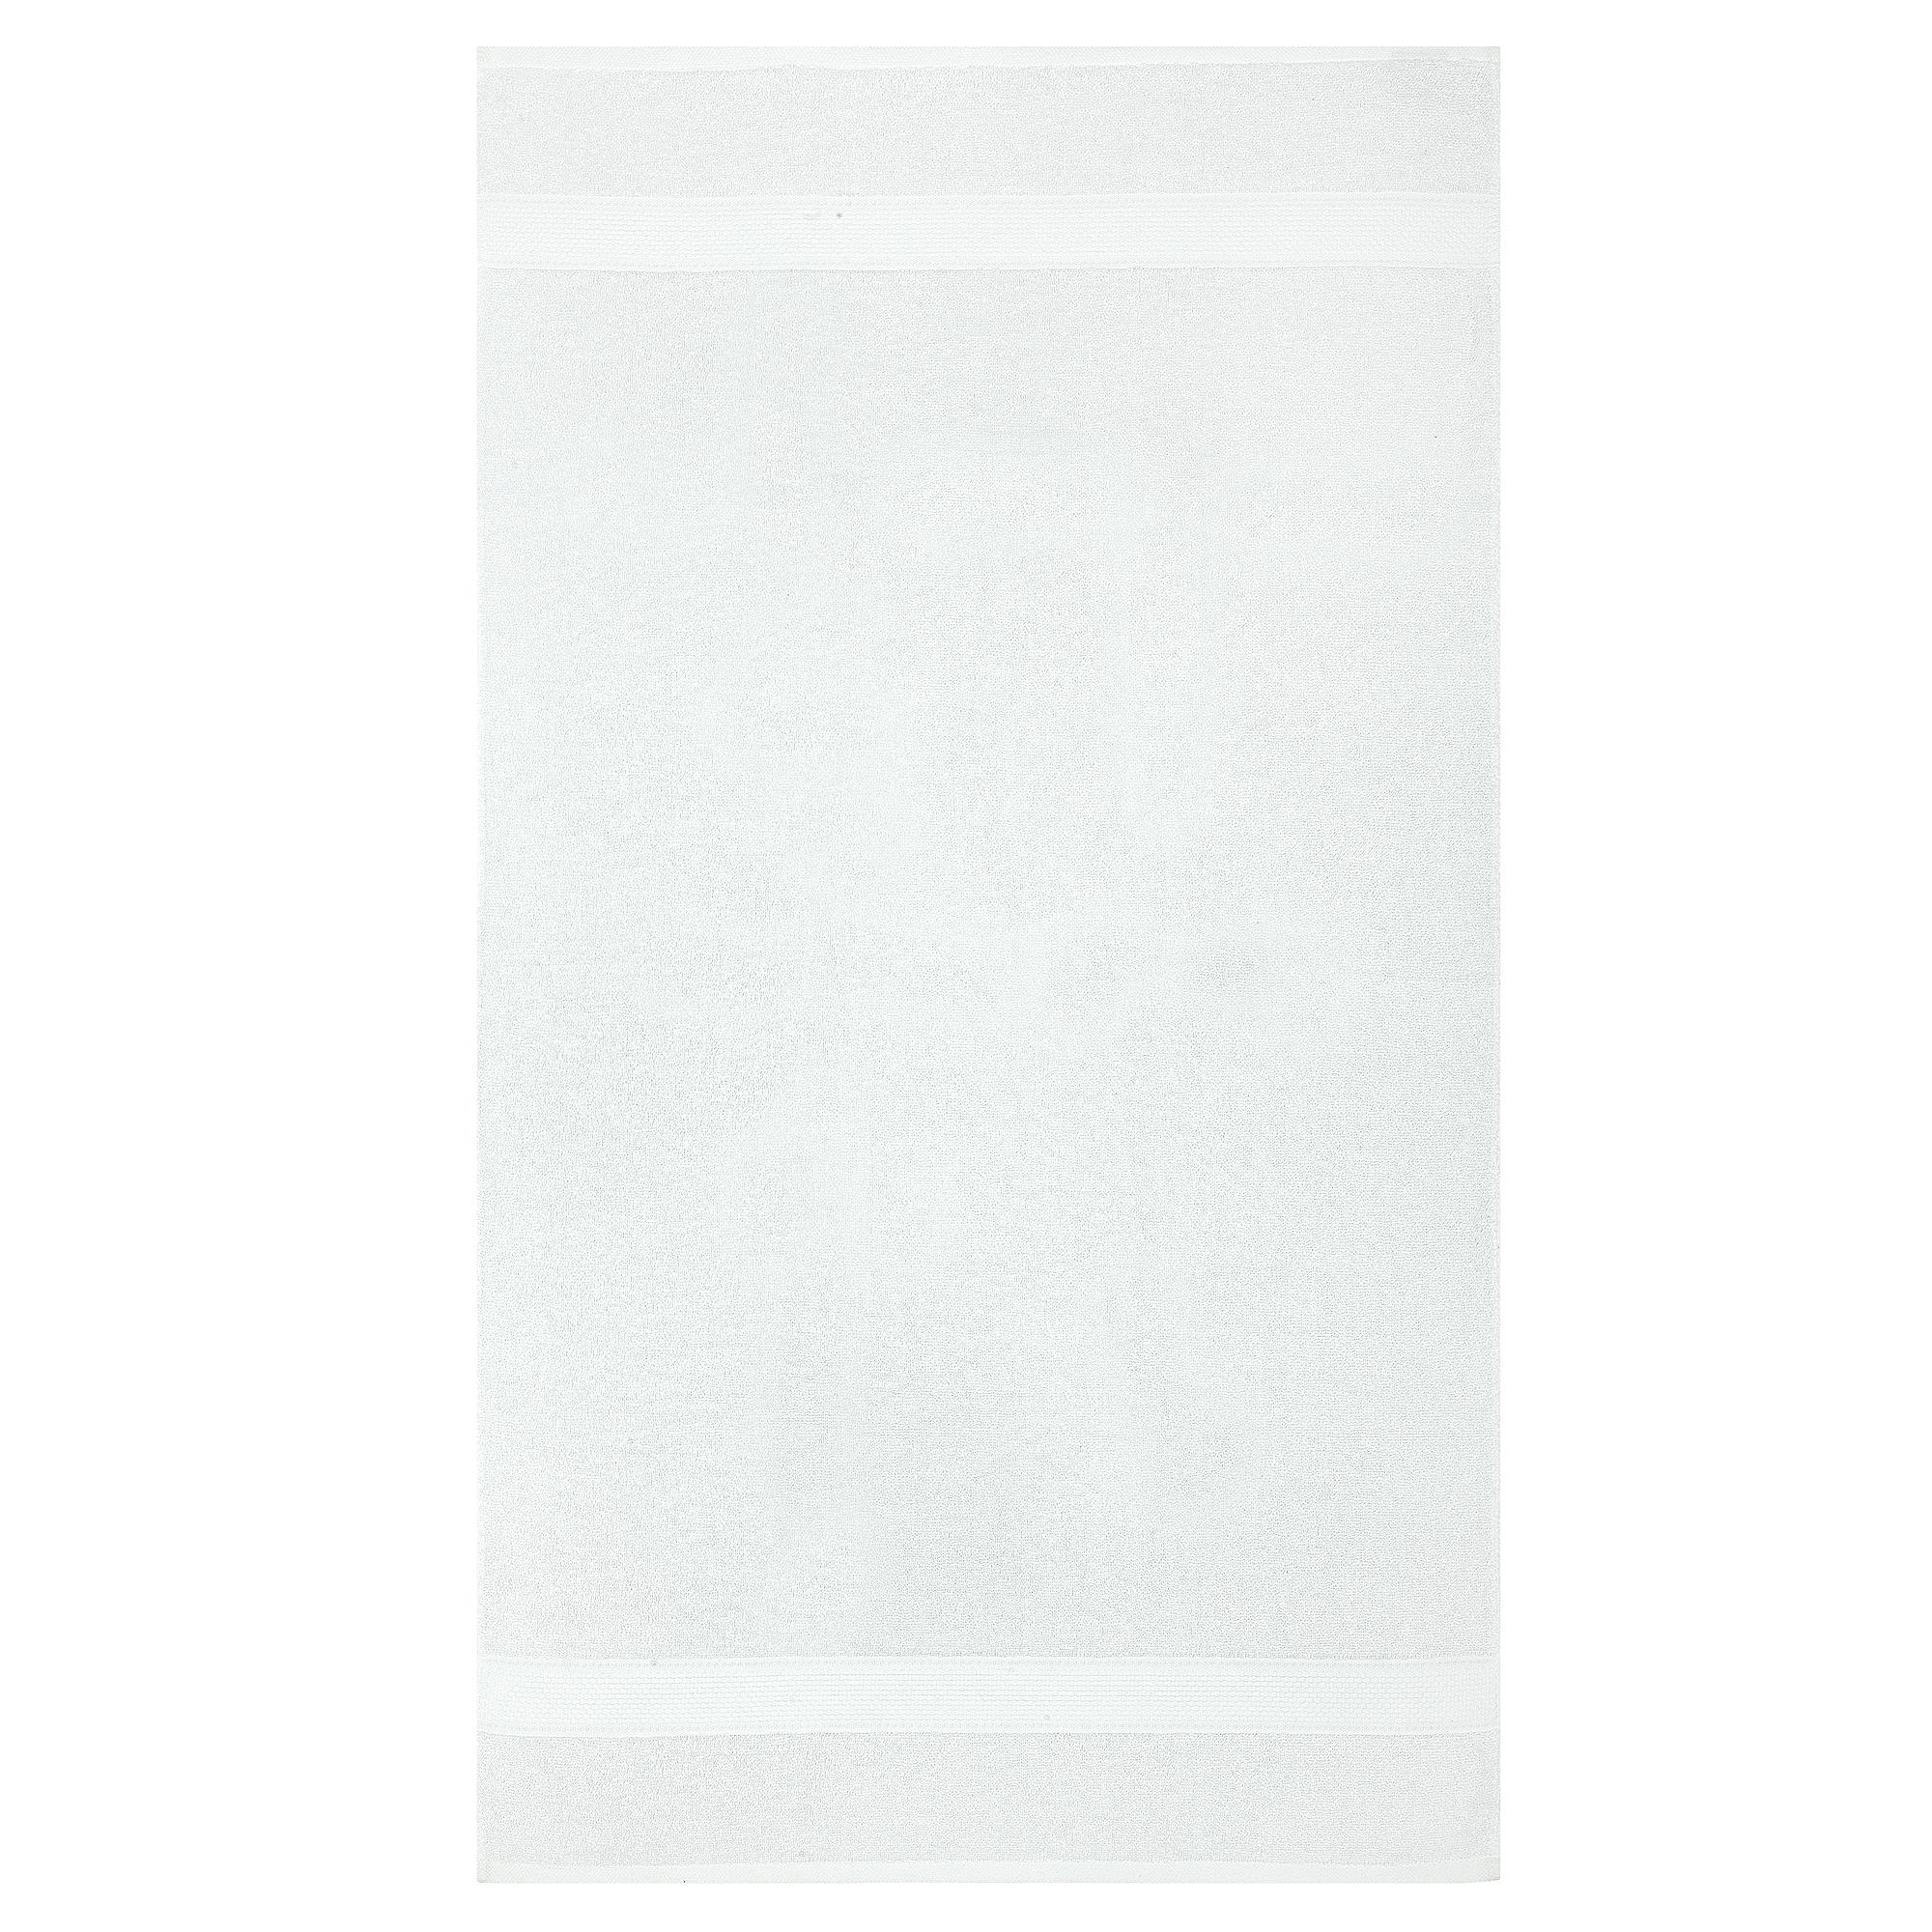 Bale Set 2pcs White Plain Extra Large Bath Sheet Towel